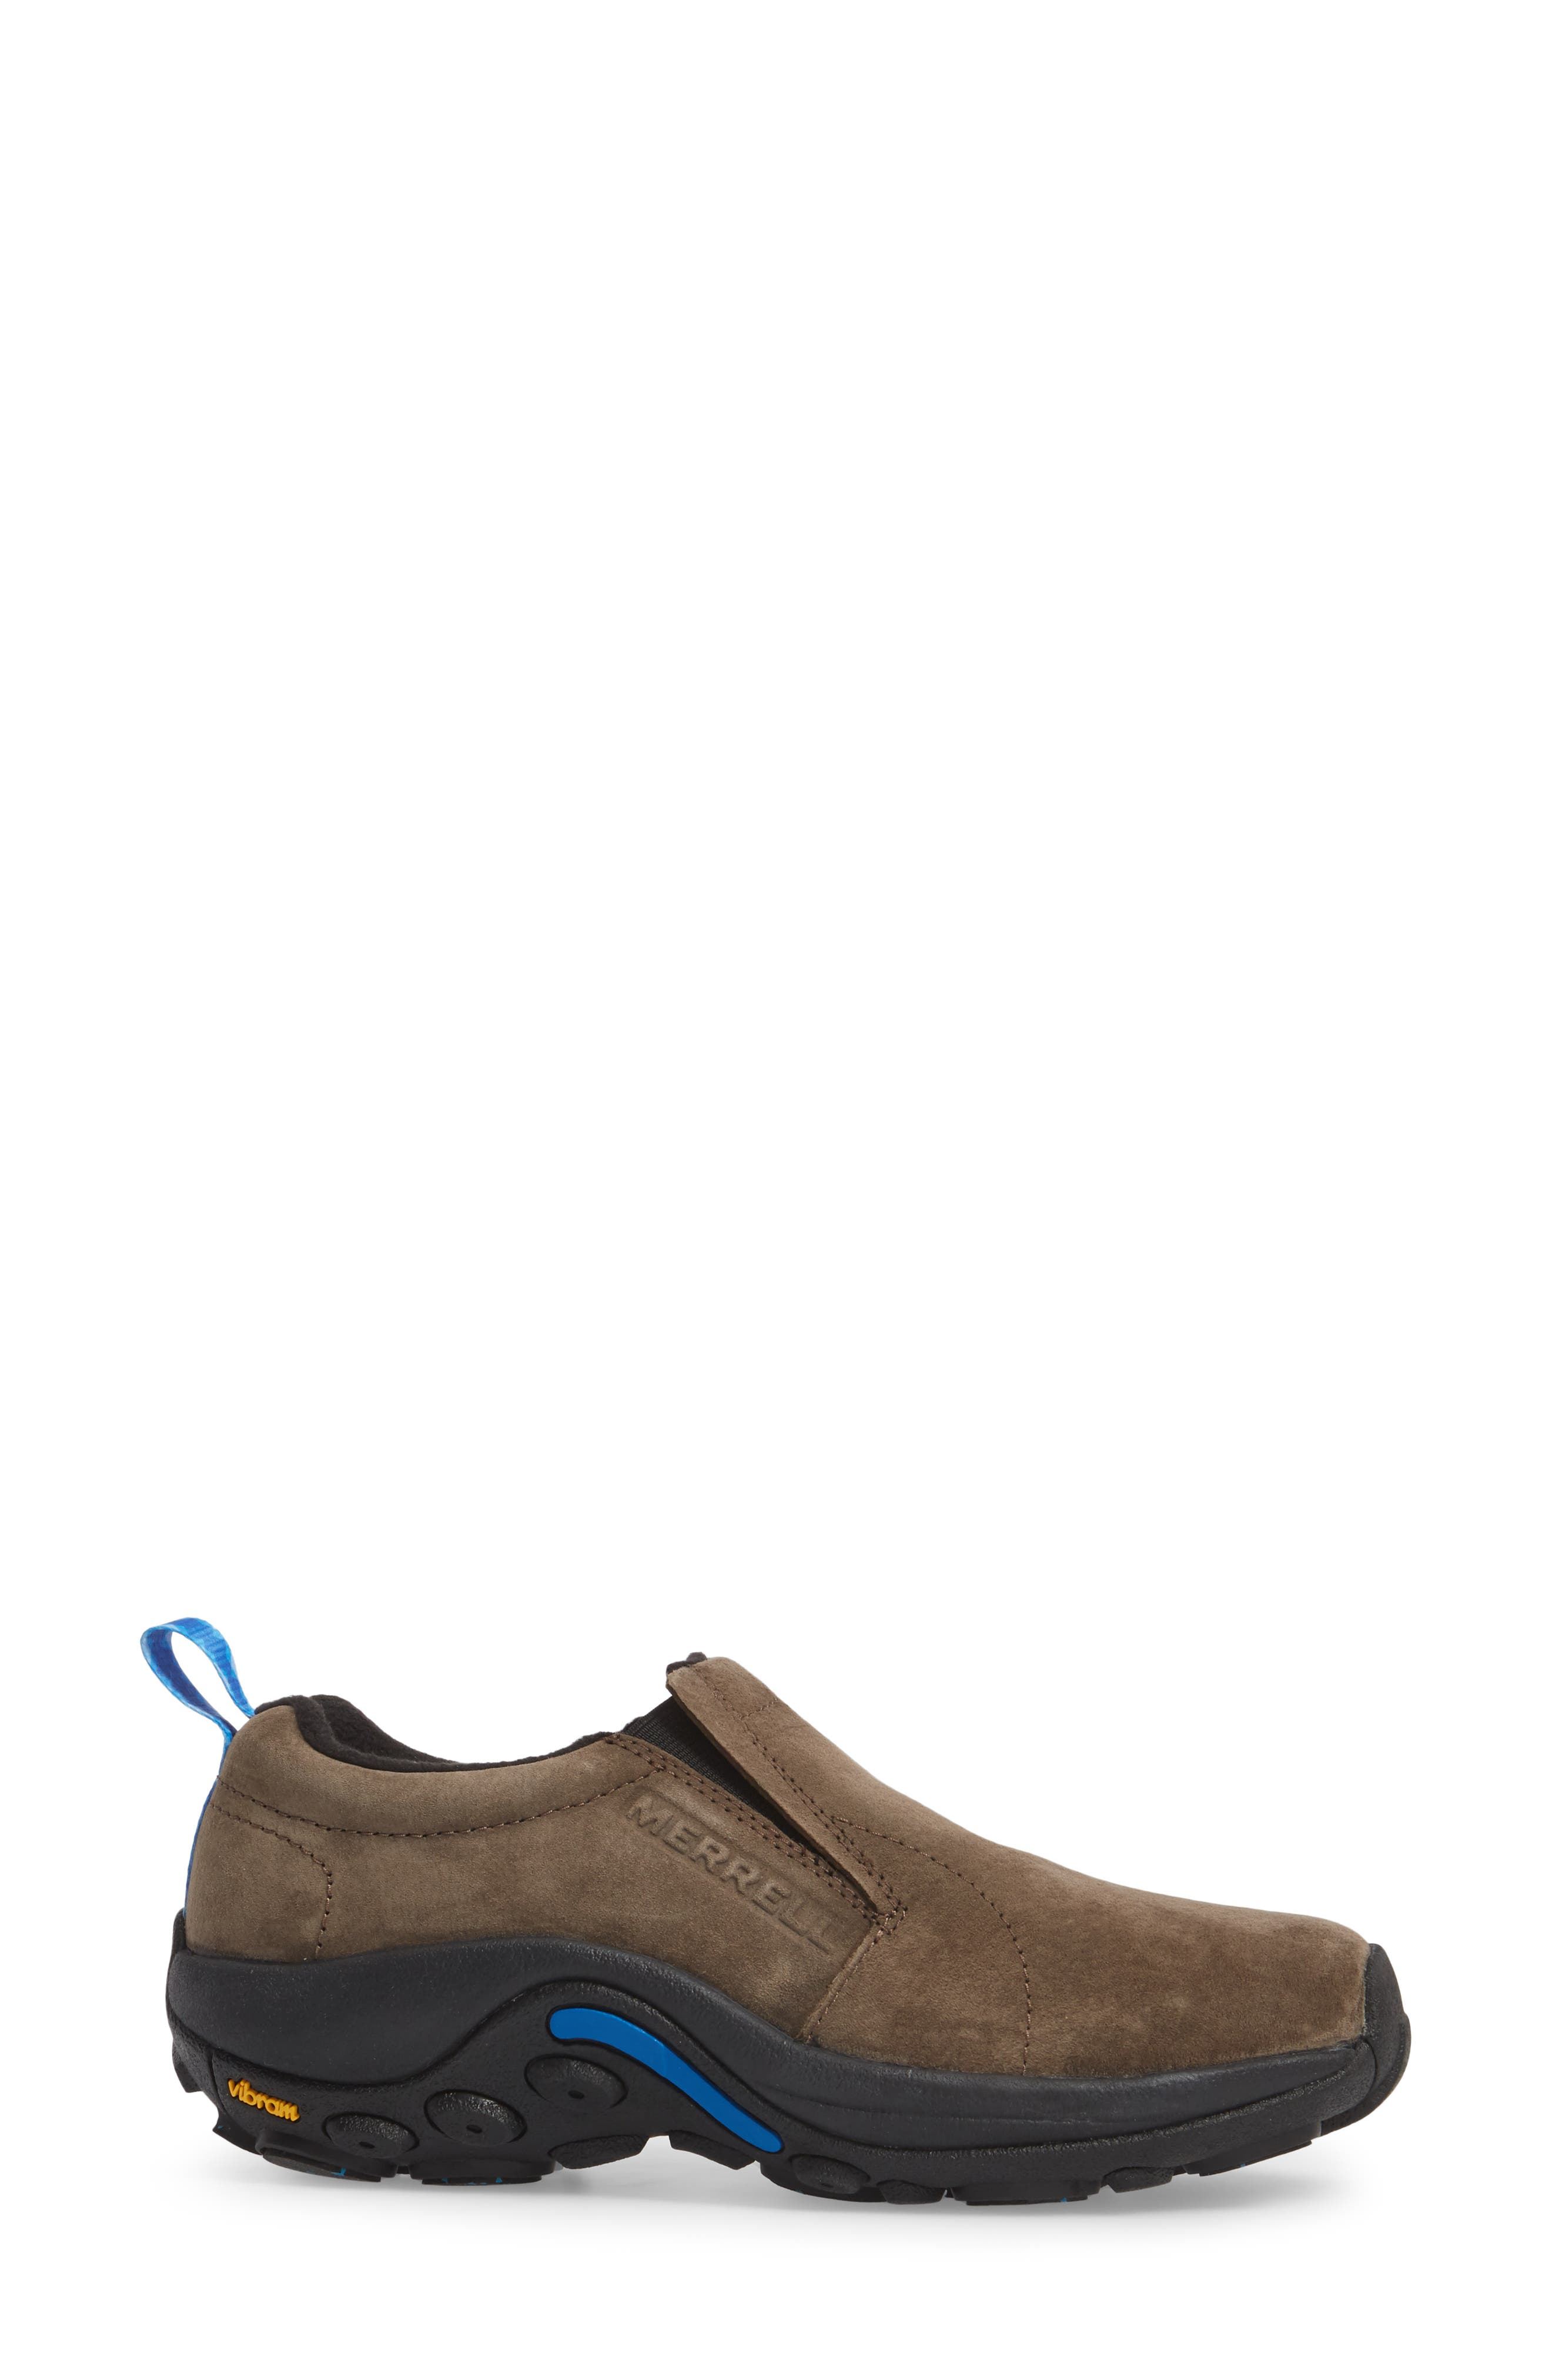 Jungle Moc Ice Waterproof Sneaker,                             Alternate thumbnail 3, color,                             Gun Smoke Leather